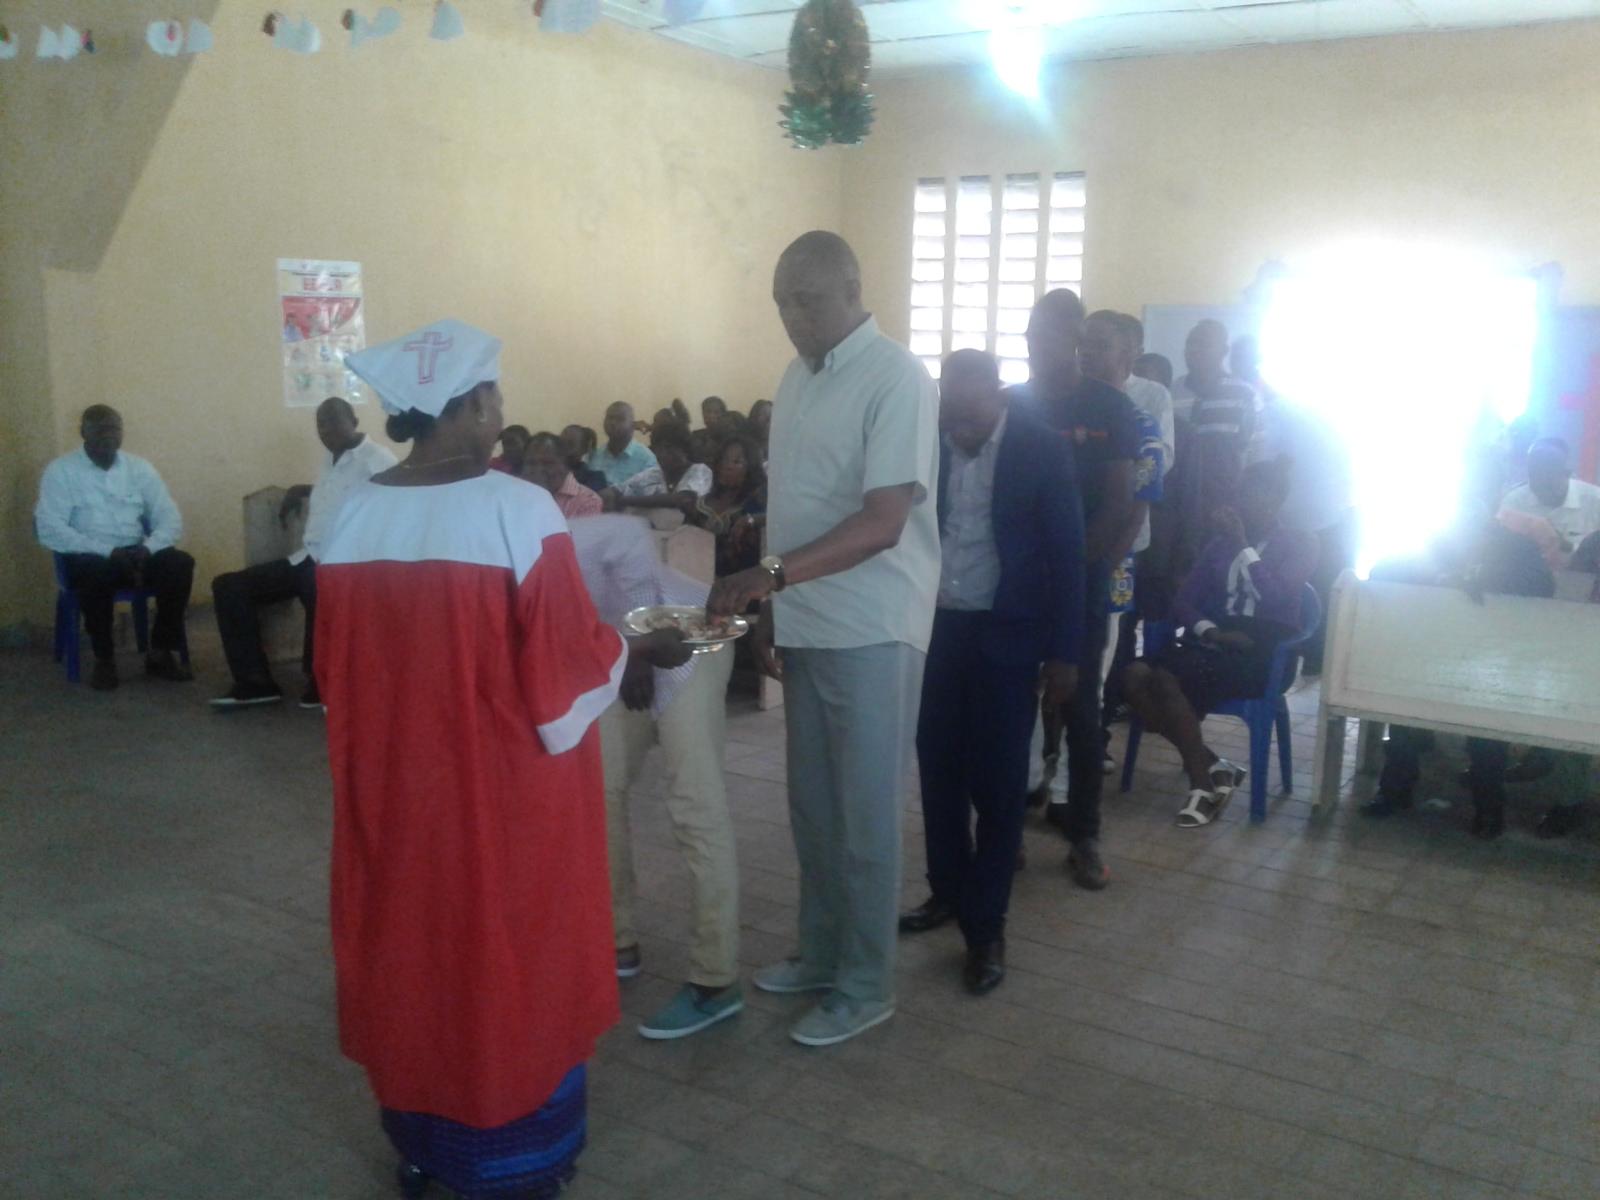 DR_Congo_Paul_Turner_20180617_104545.jpeg